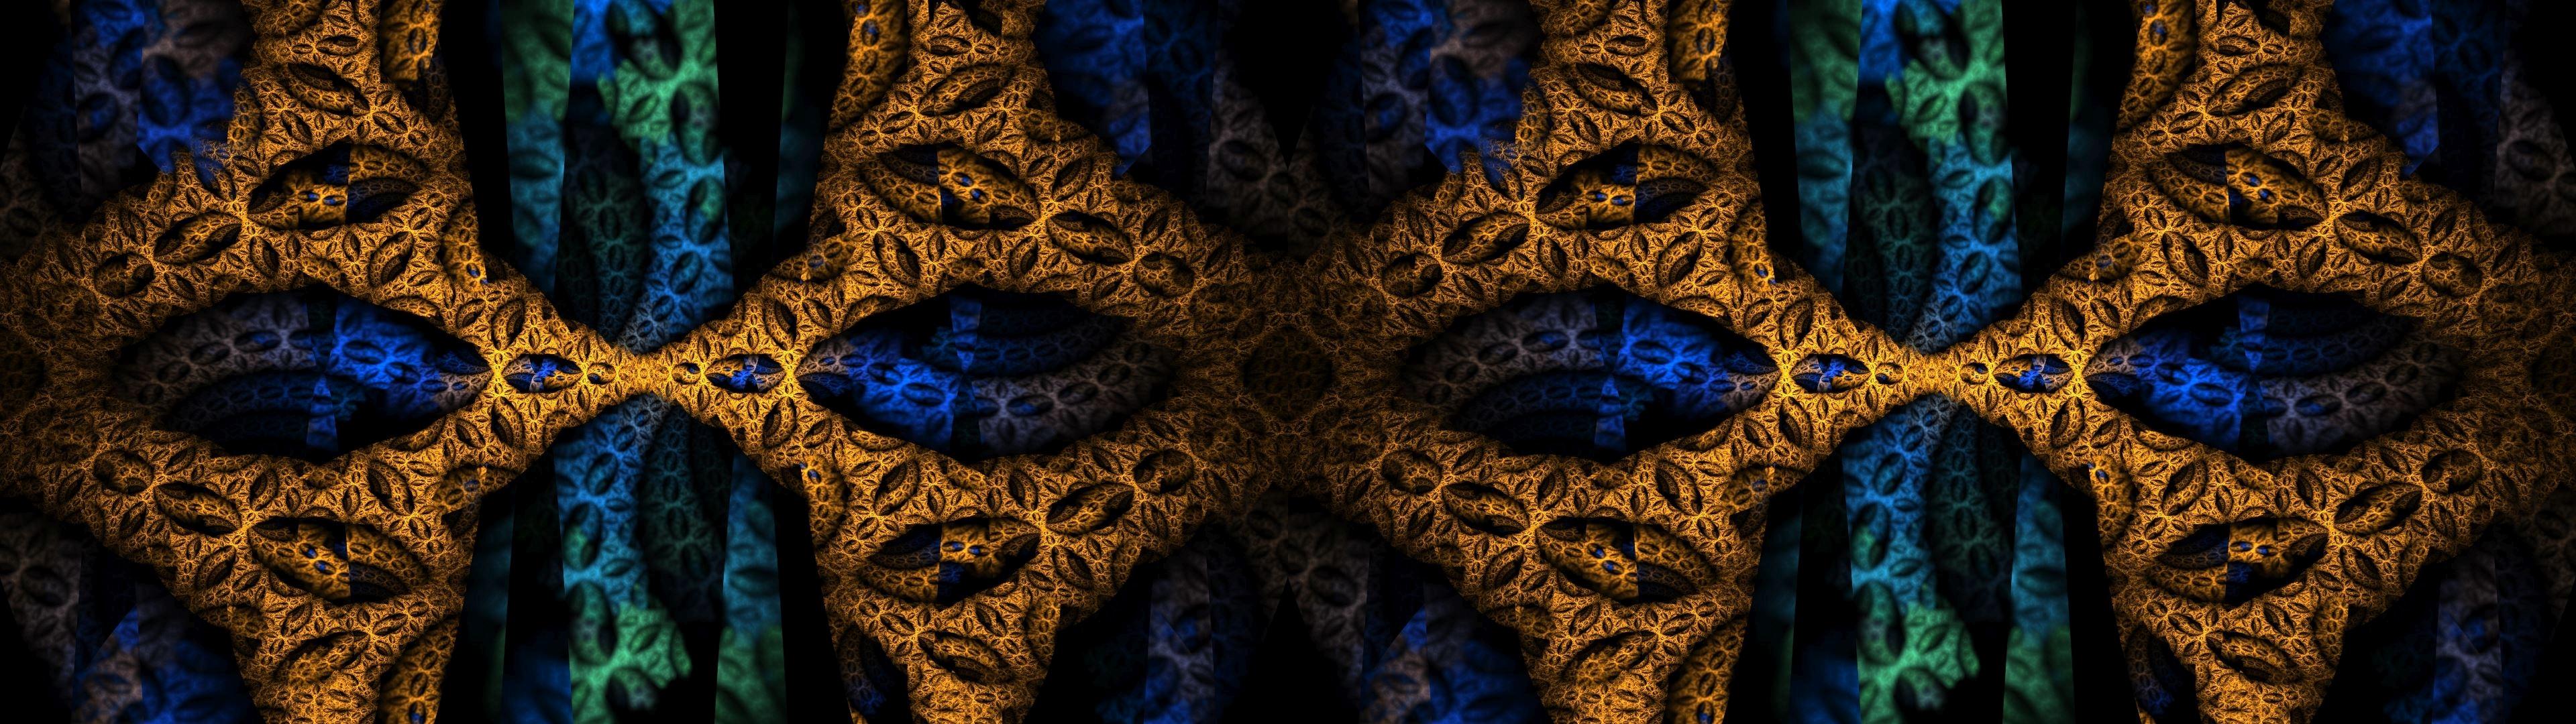 WallpaperFusion-fractal-mask-Original-3840x1080.jpg